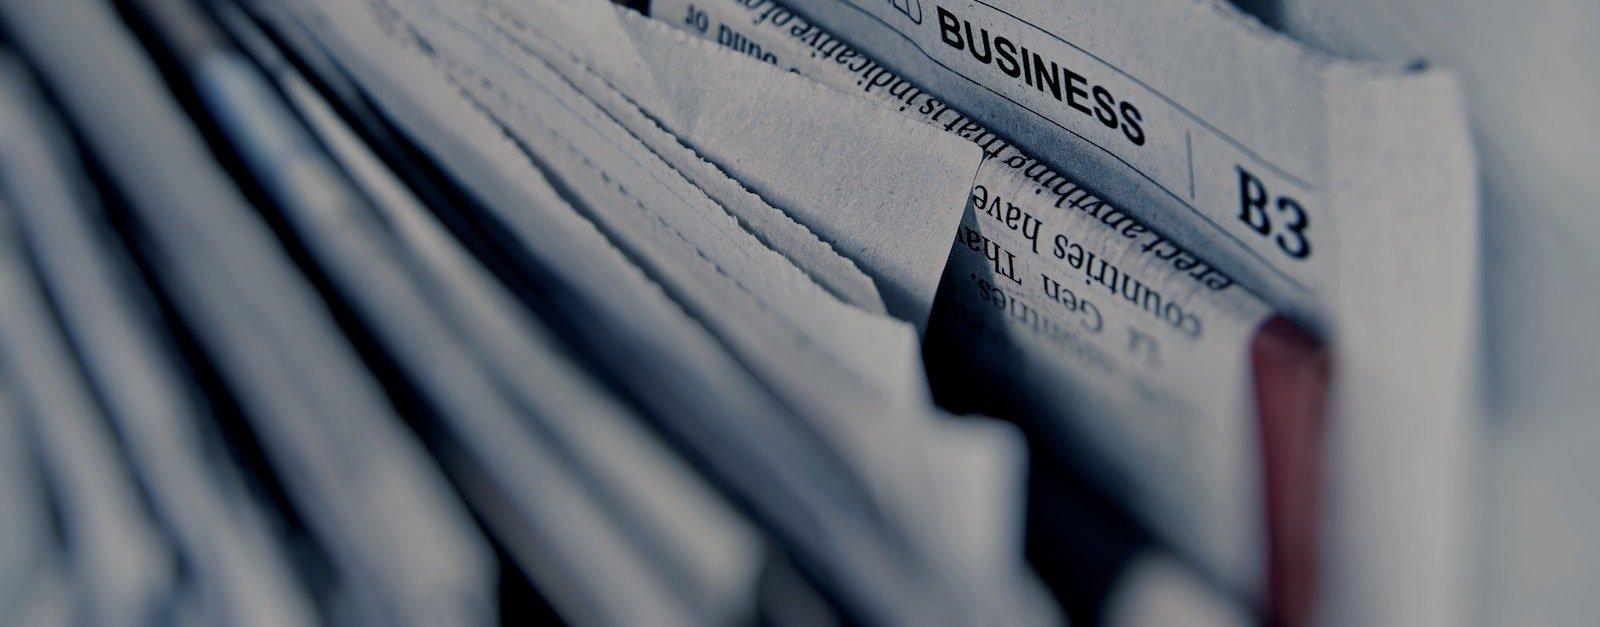 newspapers copy